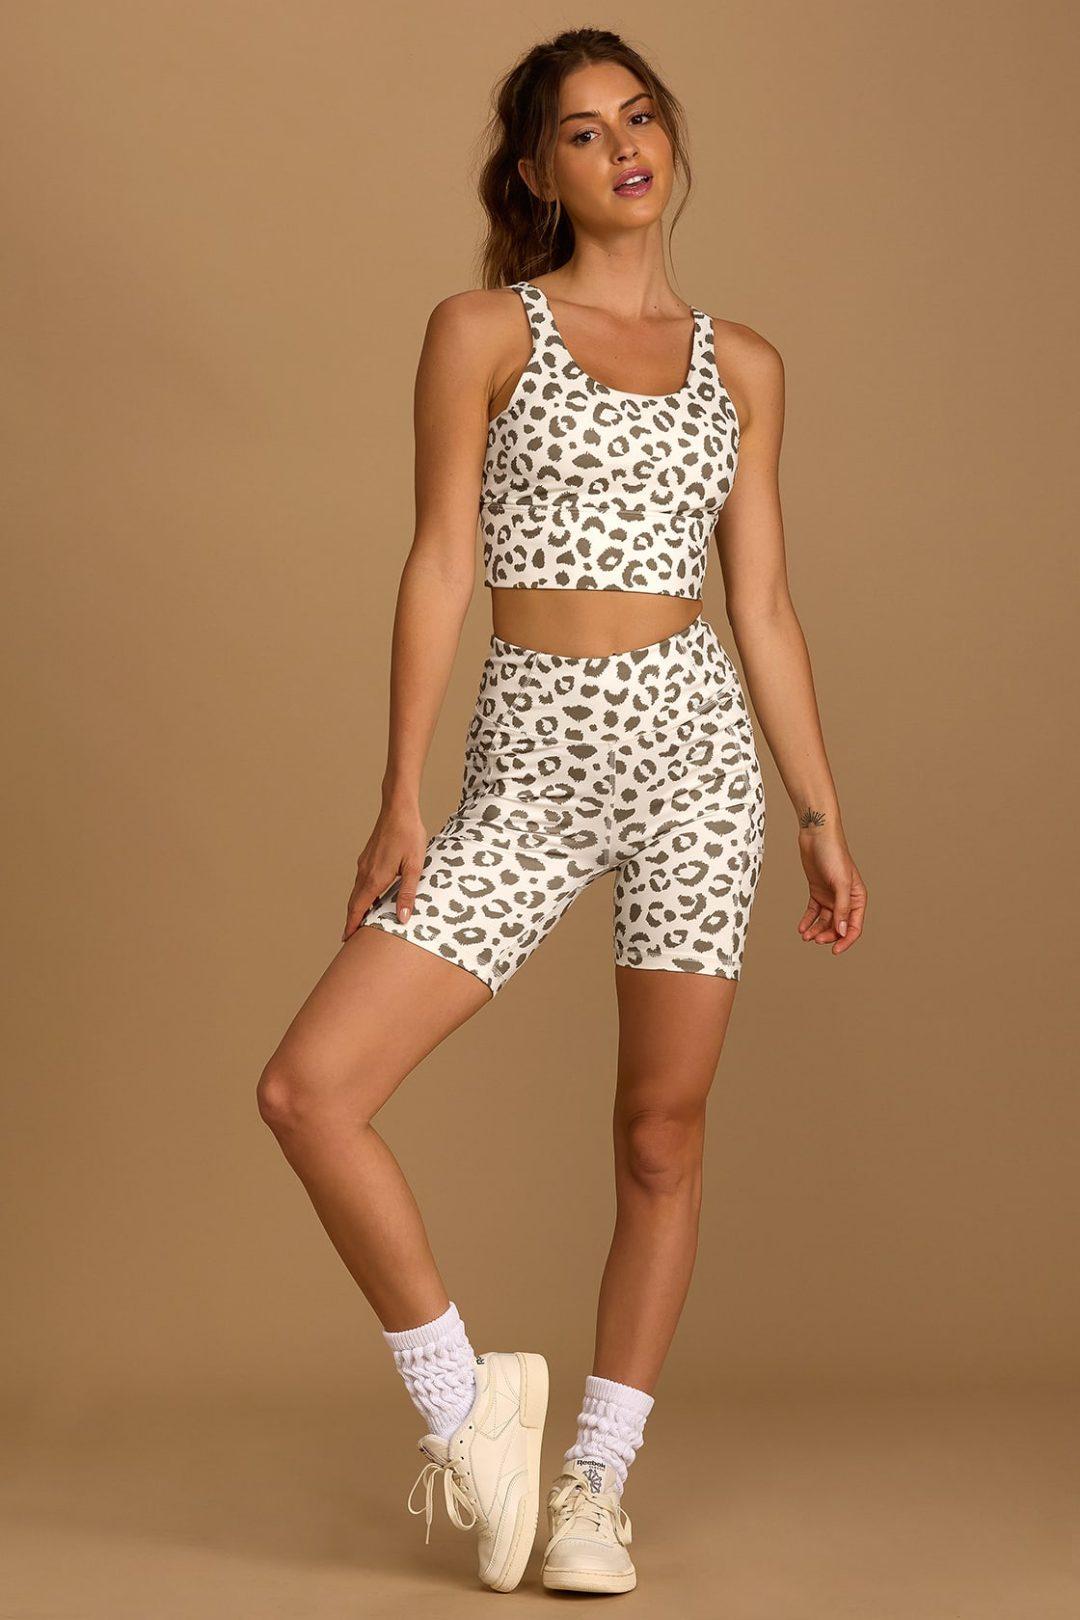 Matching white leopard print cycling shorts set